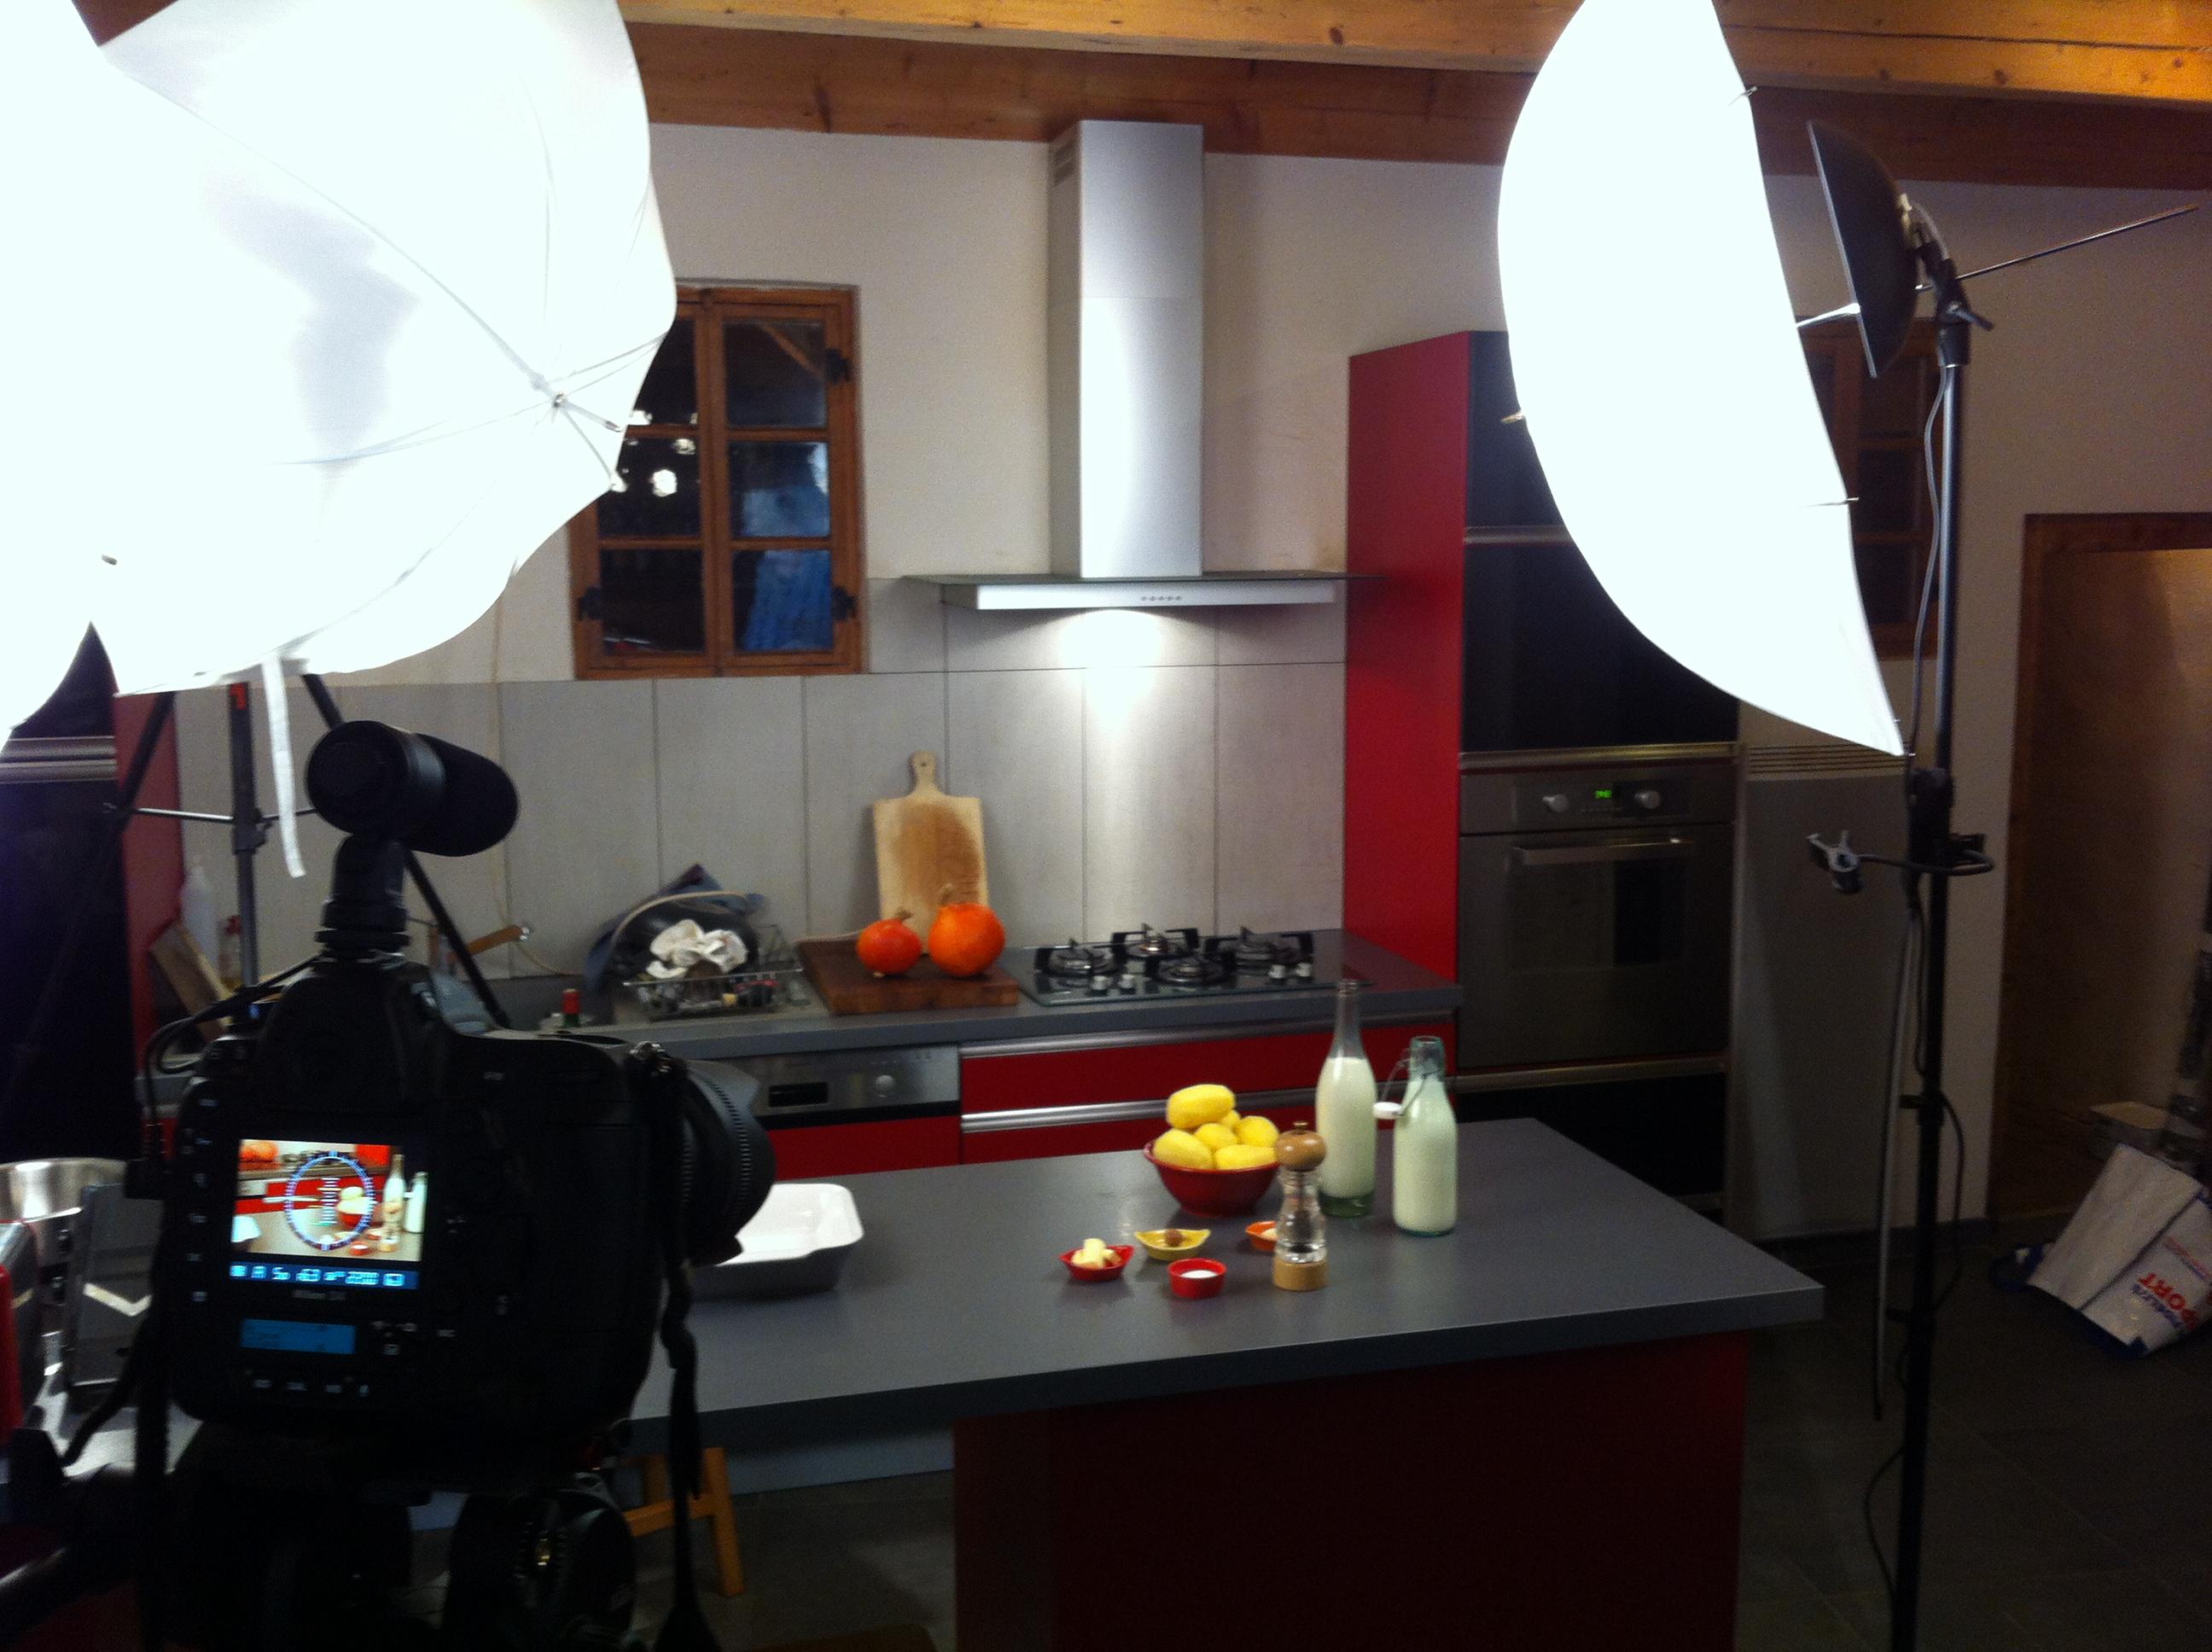 la cuisine transformé en studio vidéo